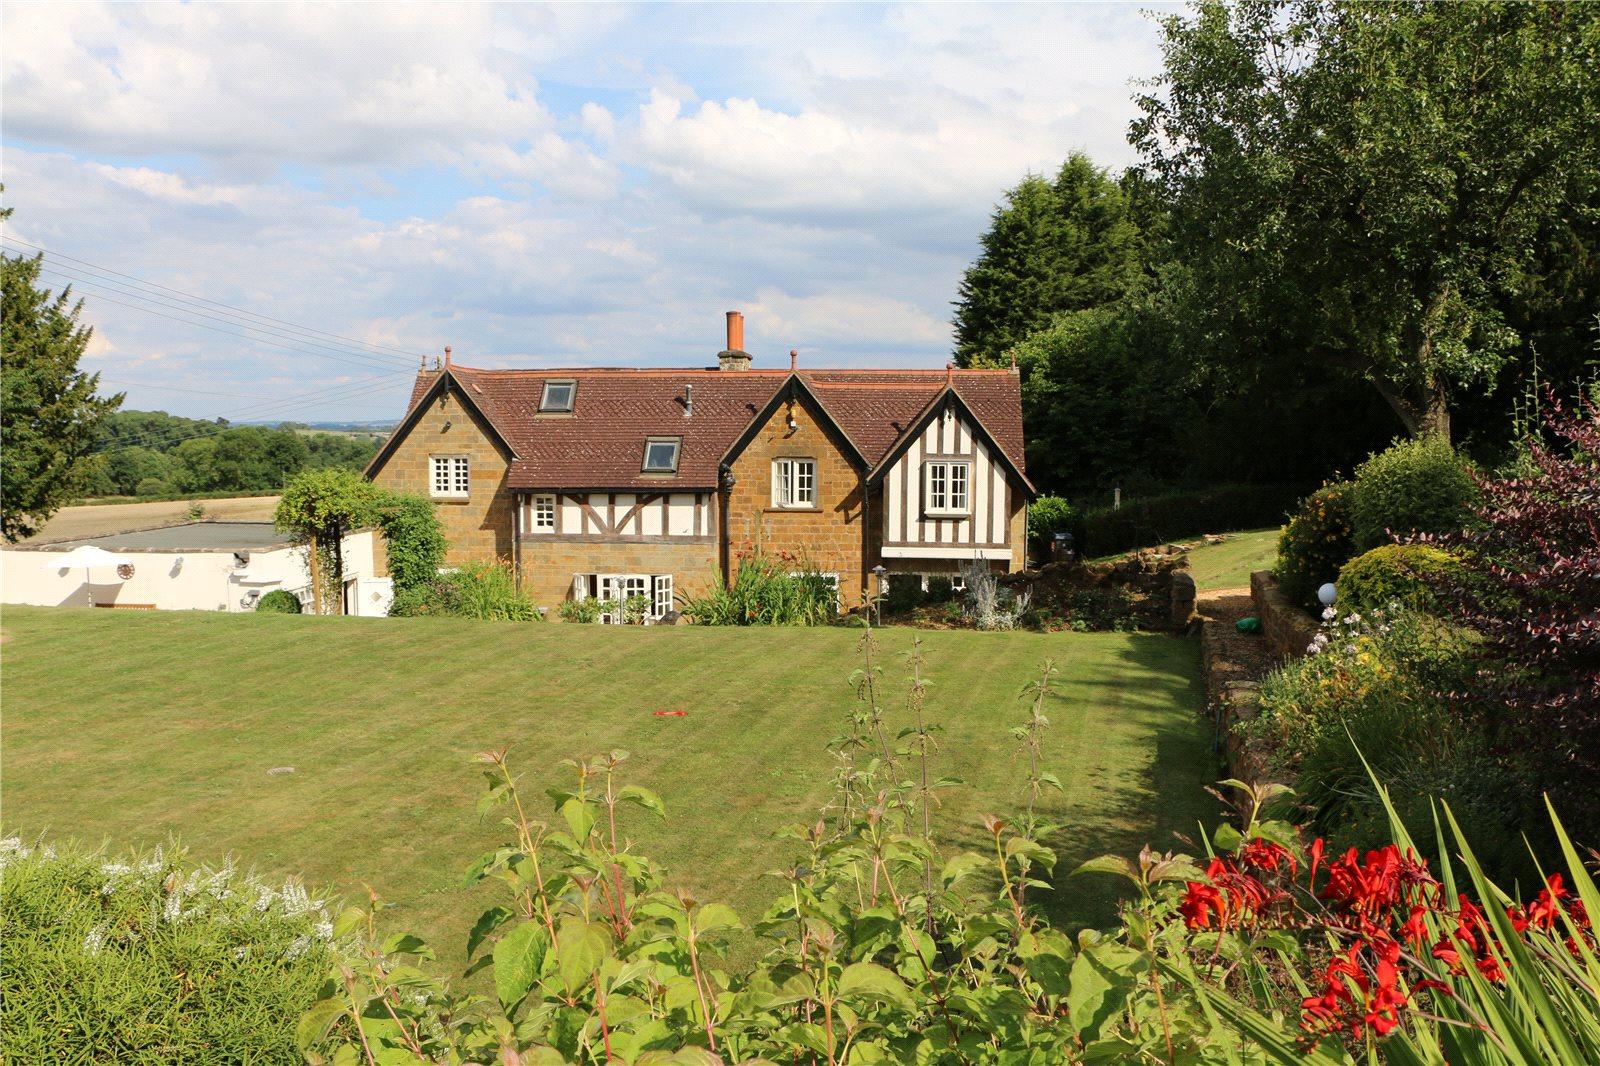 Частный дом для того Продажа на Avon Dassett, Warwickshire, CV47 Avon Dassett, Англия